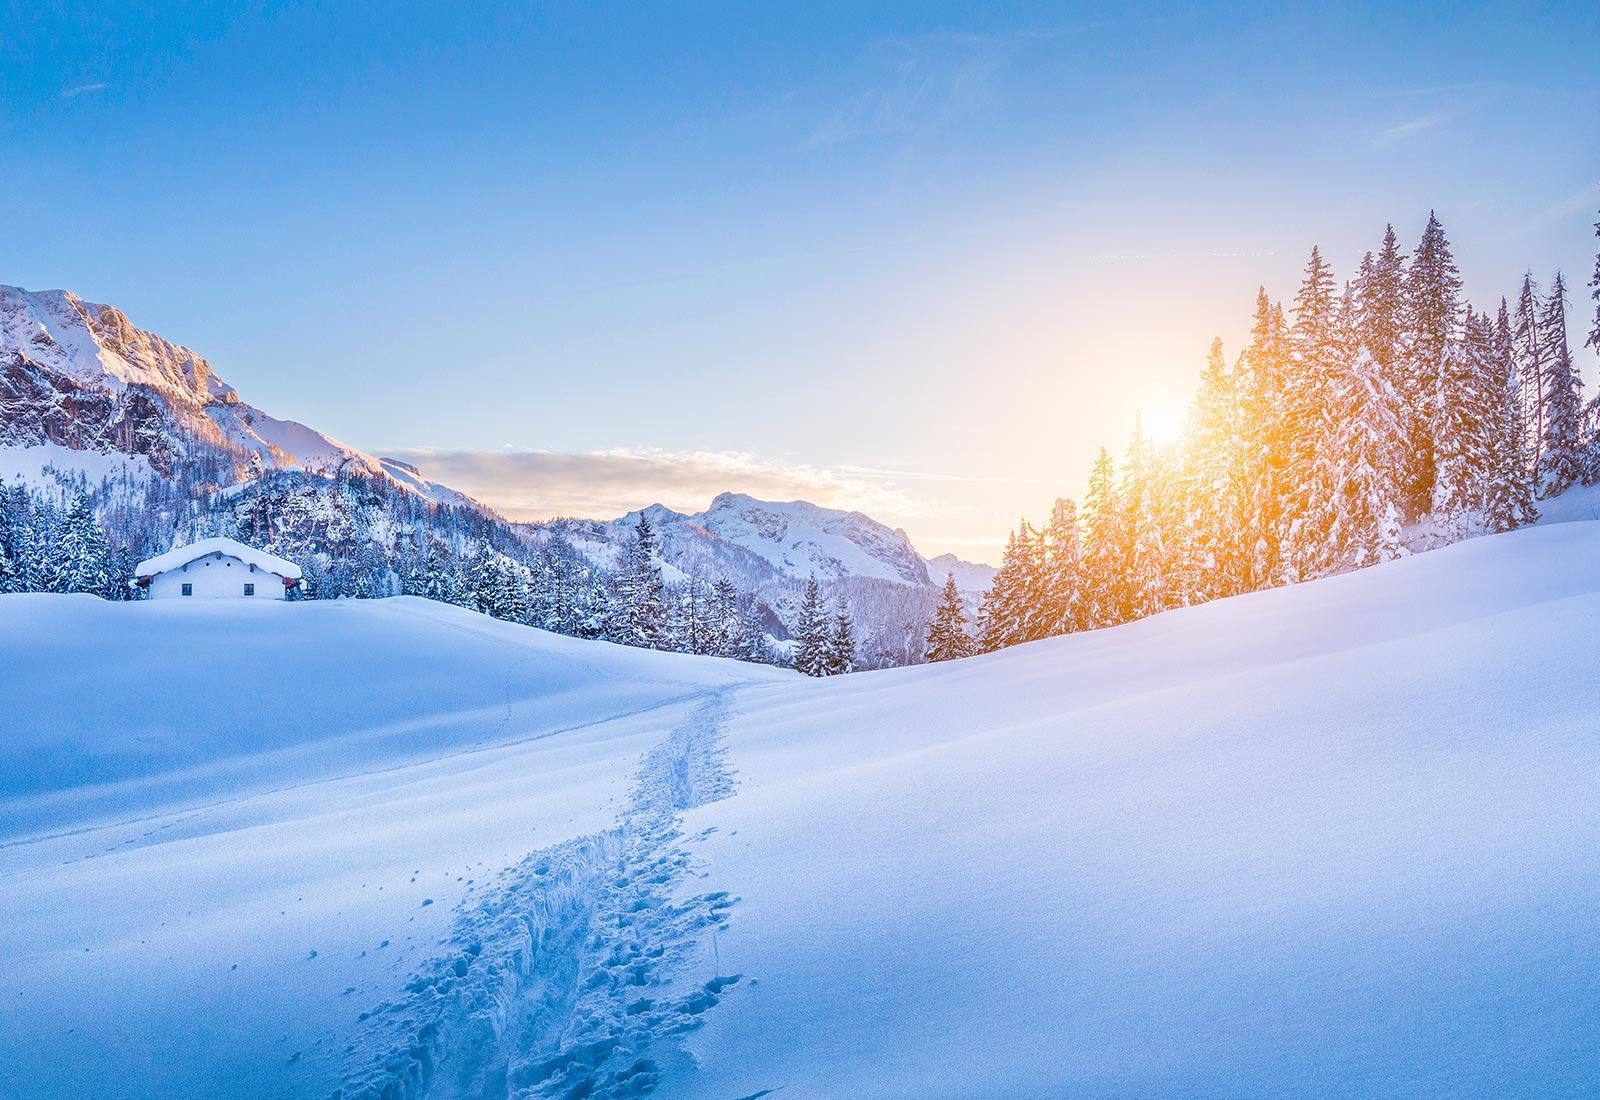 e05ca724f47beb Skiurlaub 2019/2020: Skireisen inkl. Skipass günstig bei weg.de buchen